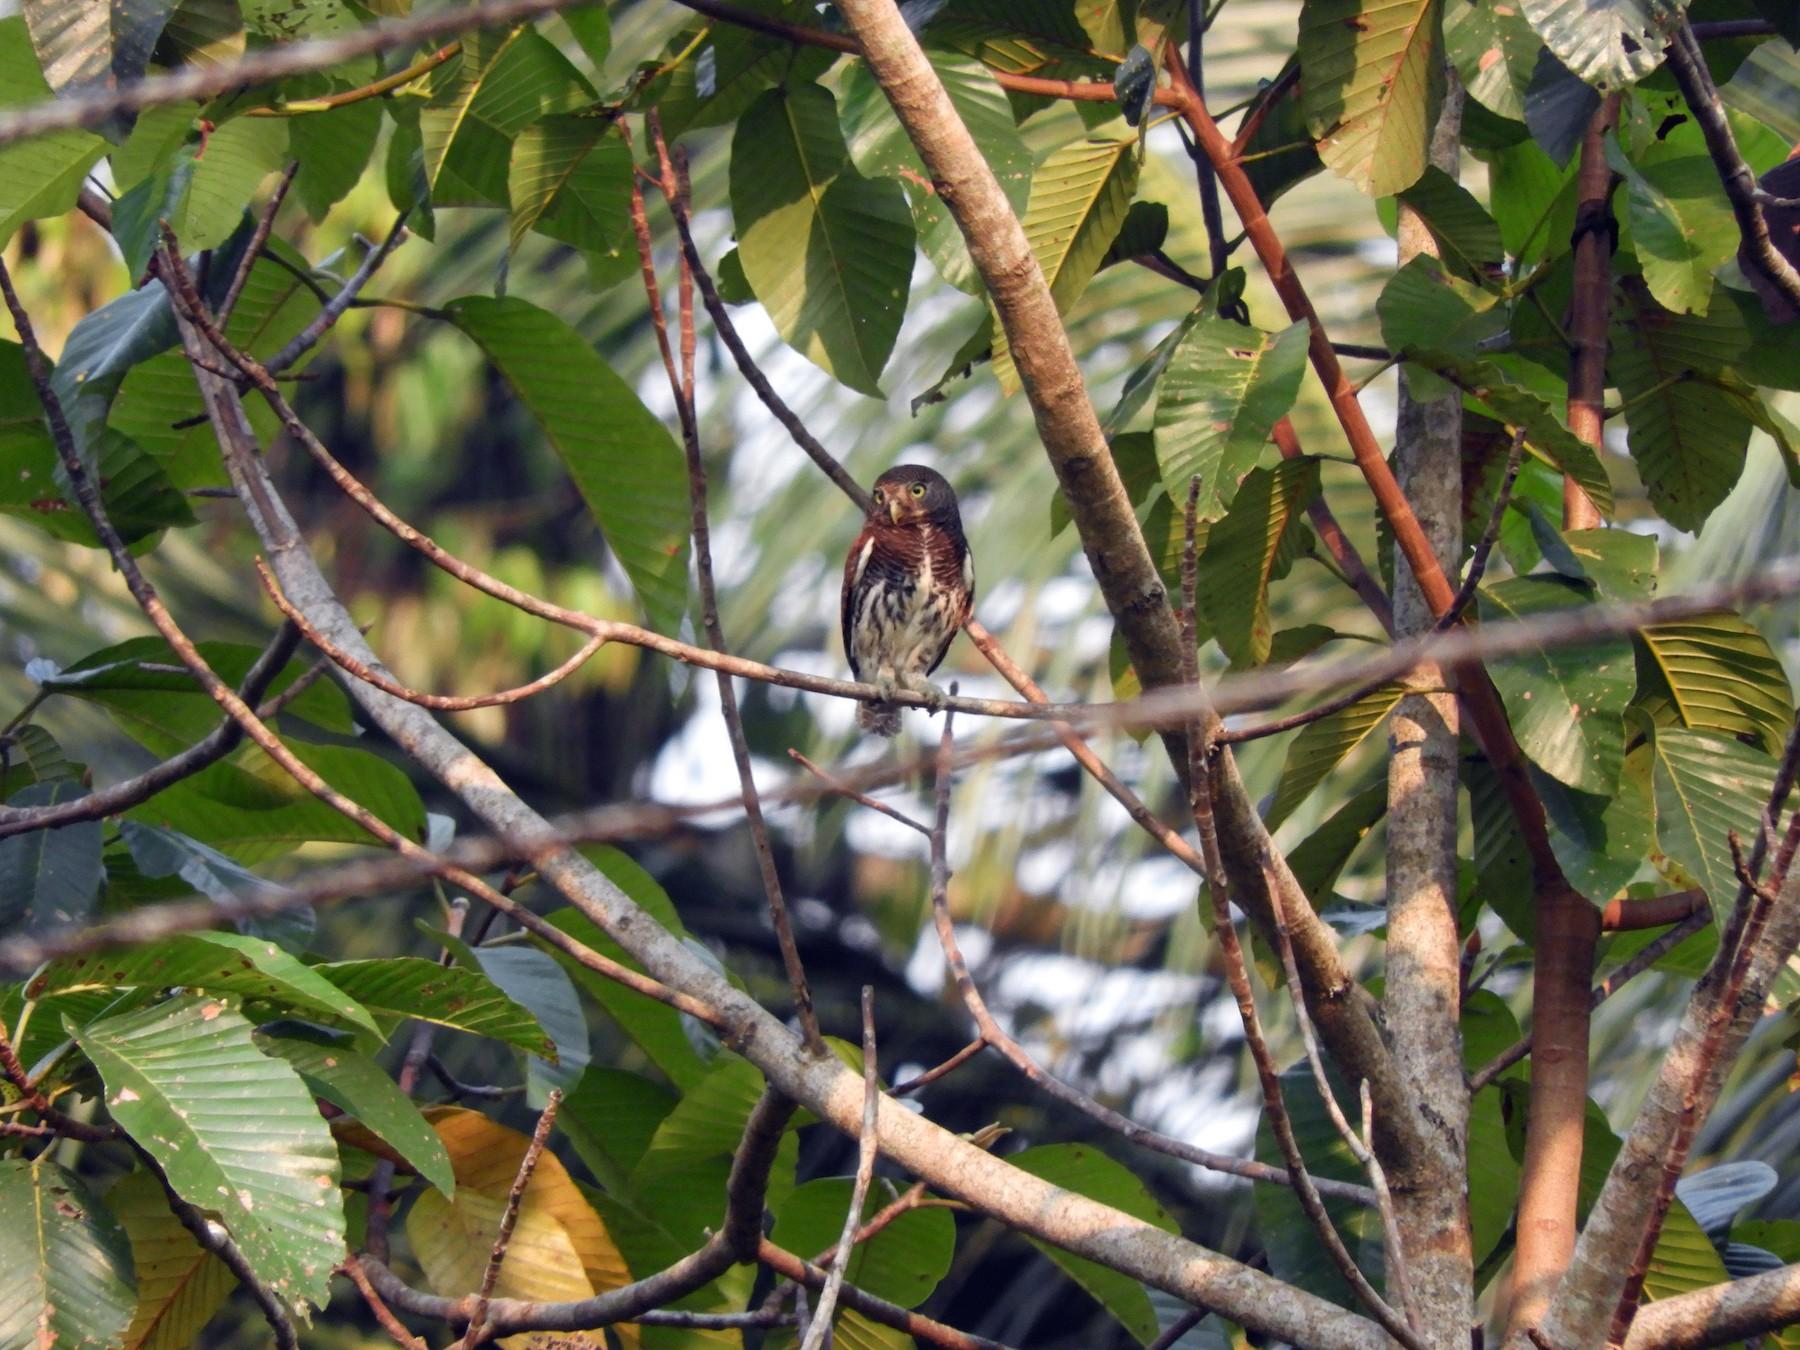 Chestnut-backed Owlet - Anonymous eBirder